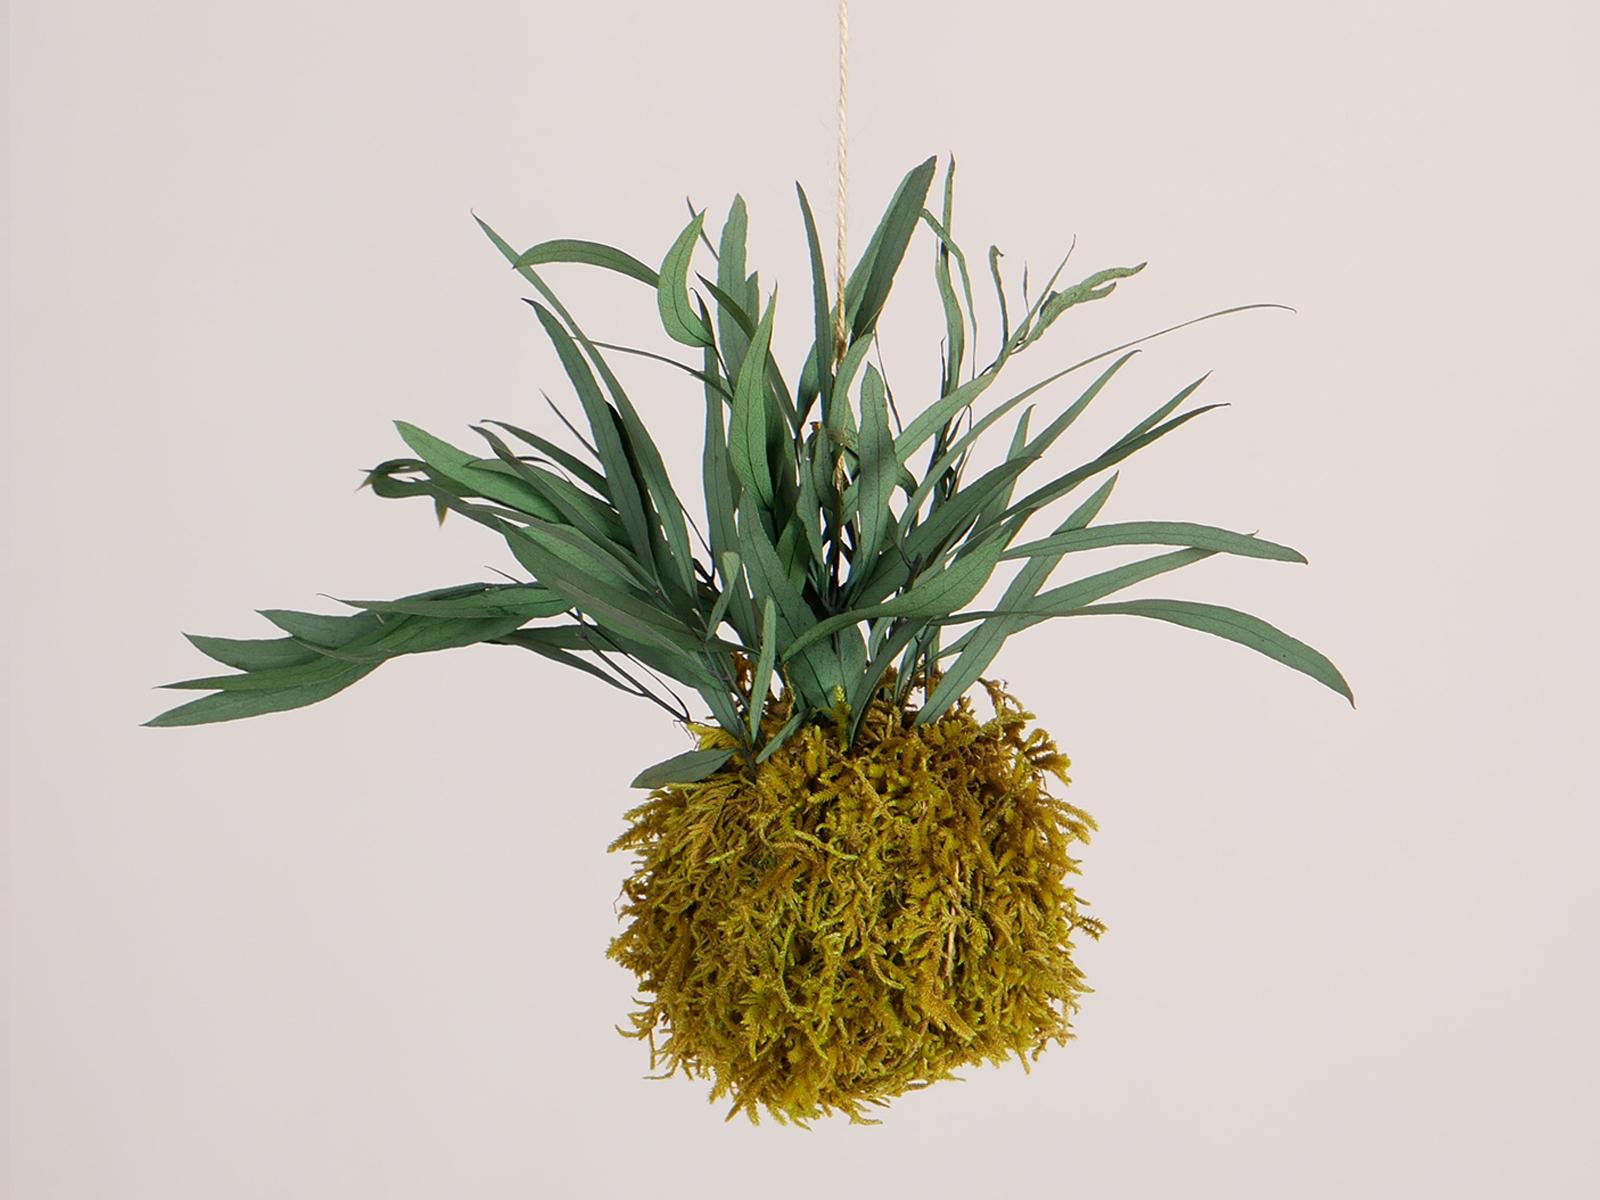 Hangende mosbol springgreen eucalyptus 9cm